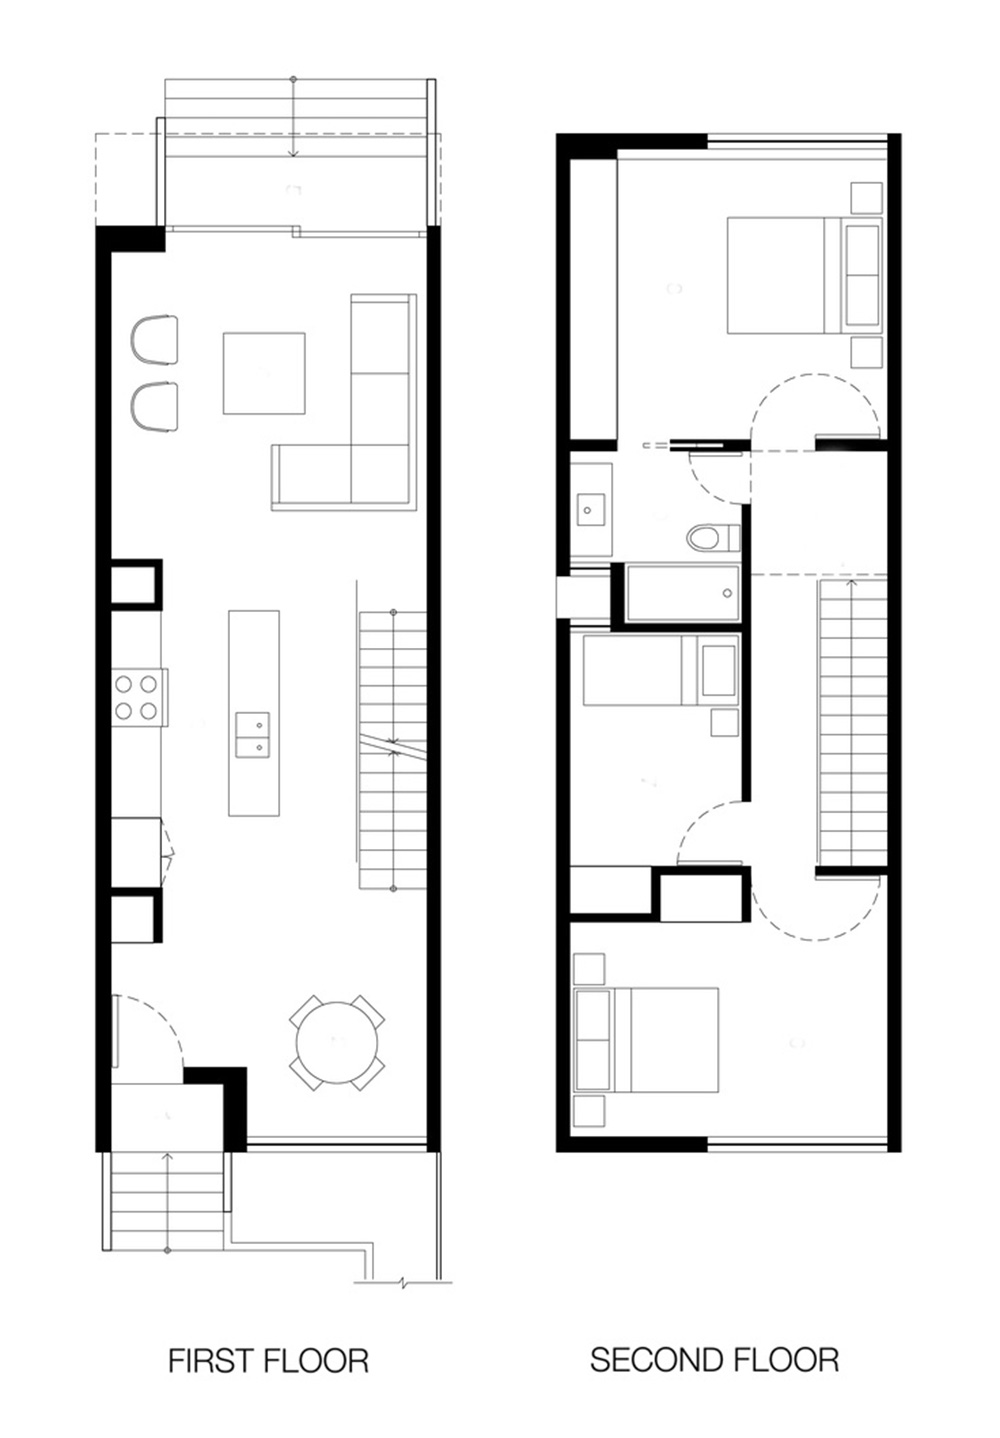 Image Result For Desain Lantai Dapur Minimalis